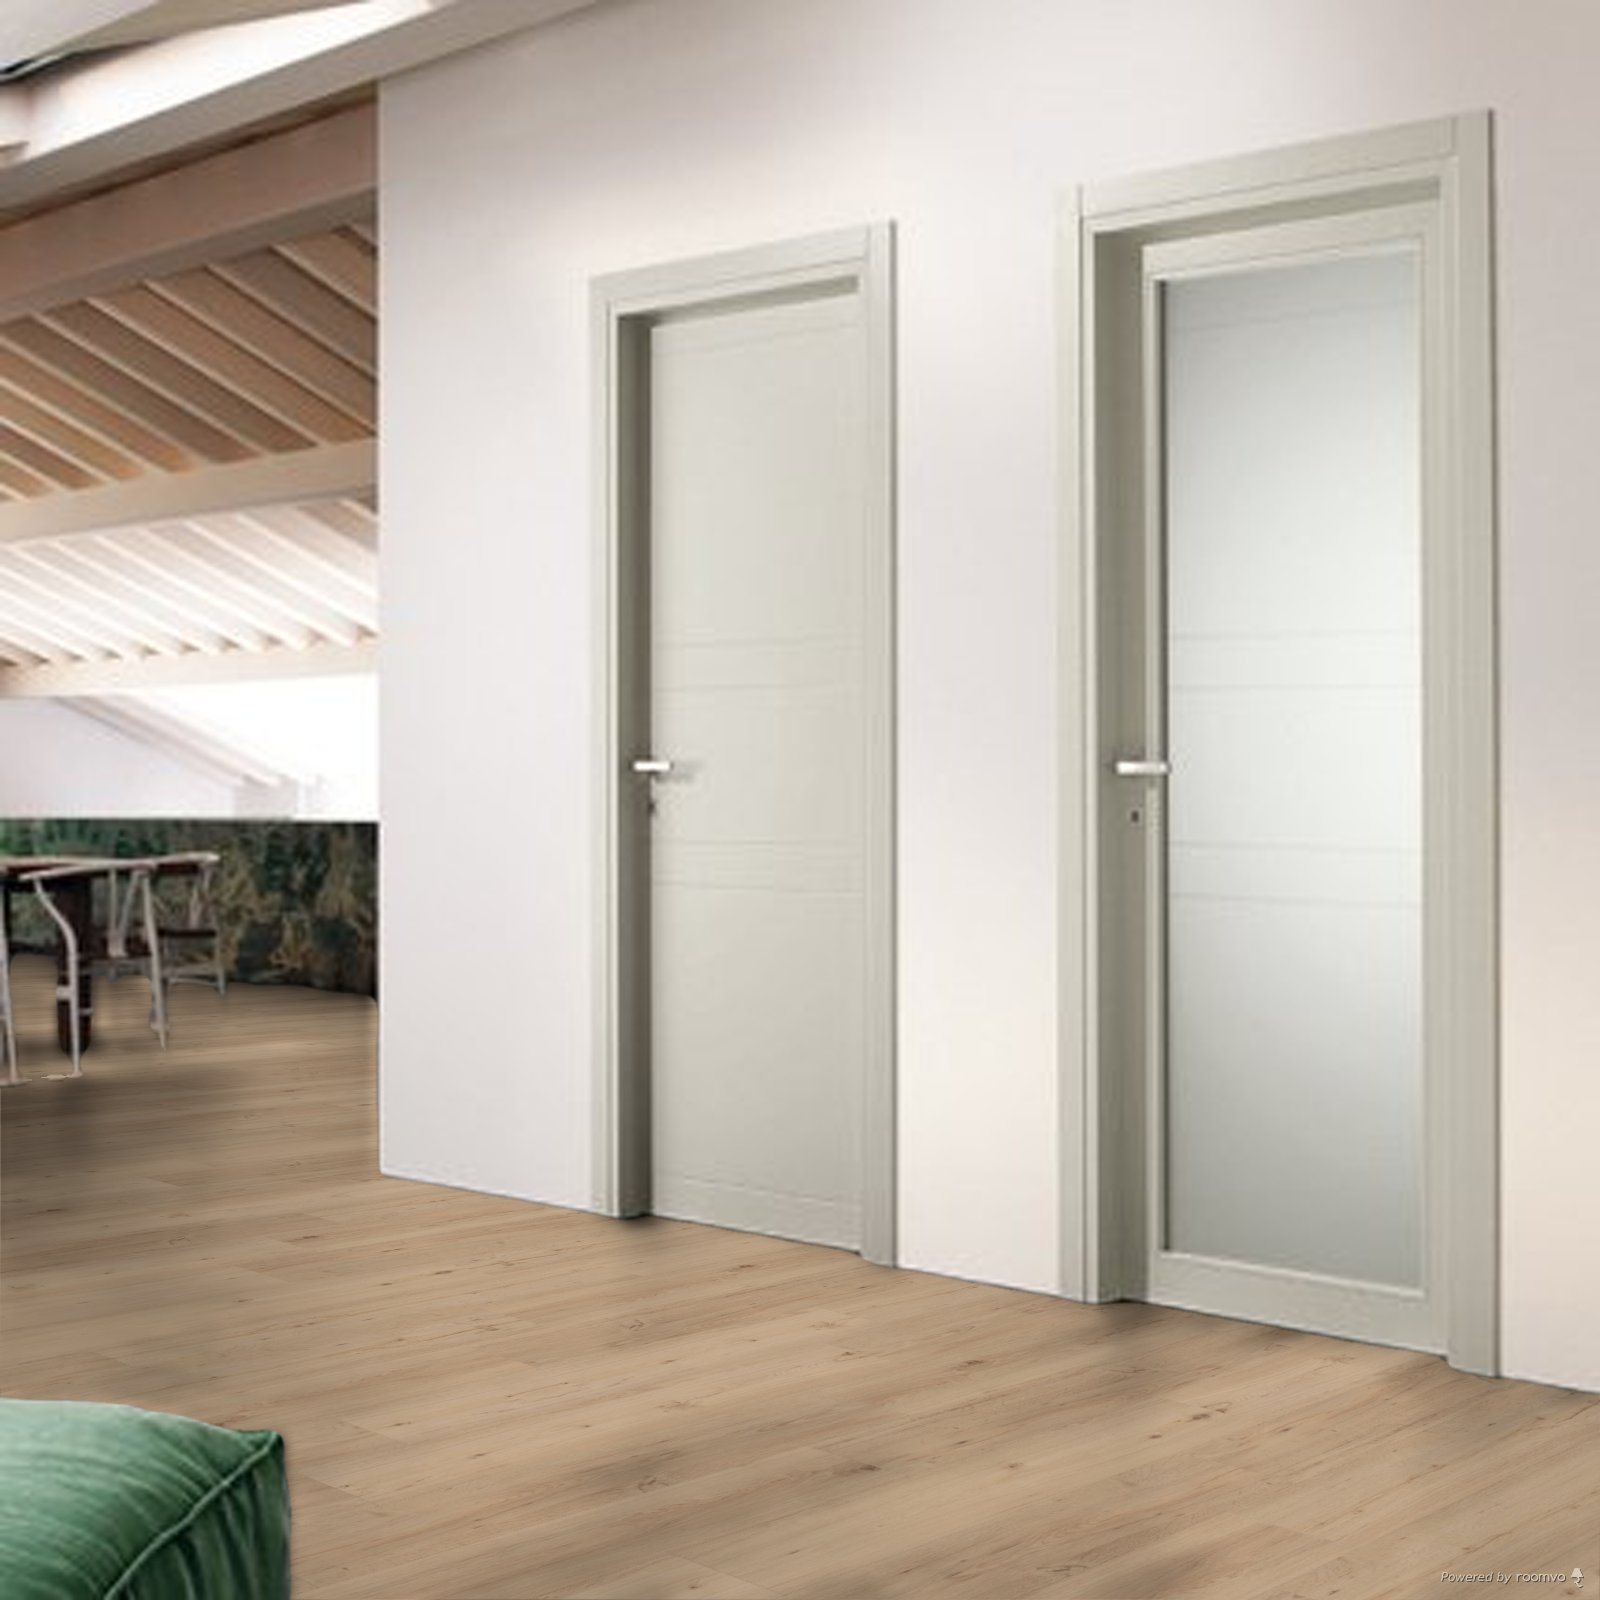 Co vyberem za dvere? - hedvabne seda